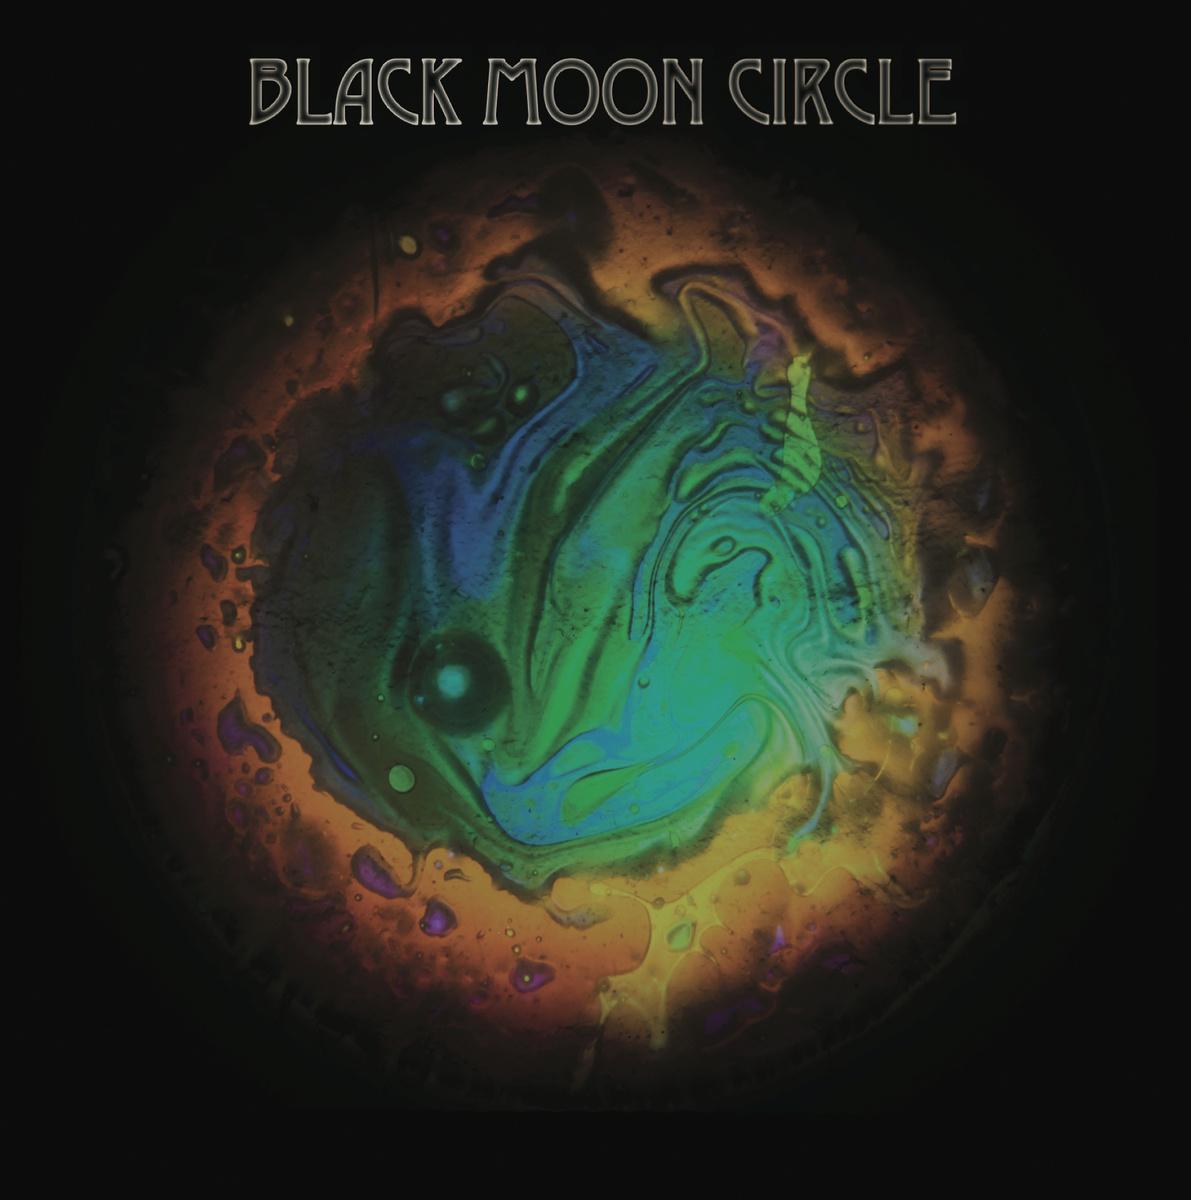 black moon circle the studio jams 1 yellow nebula in the sky